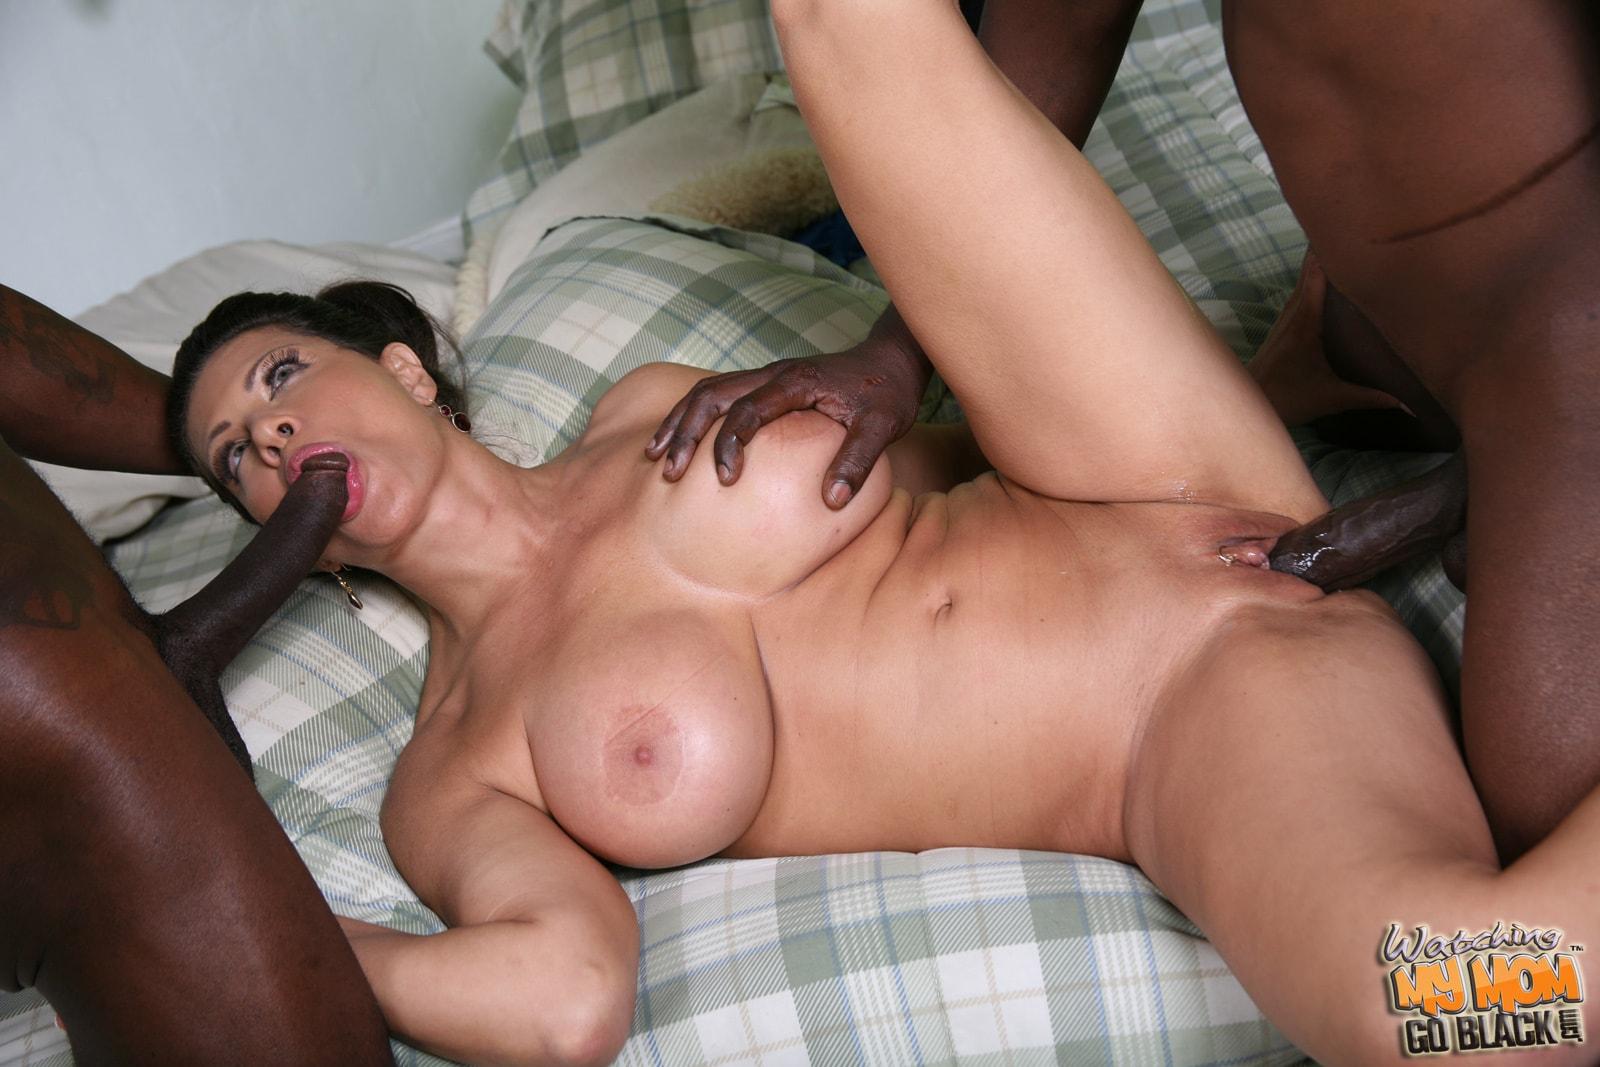 Nude cougar free pics